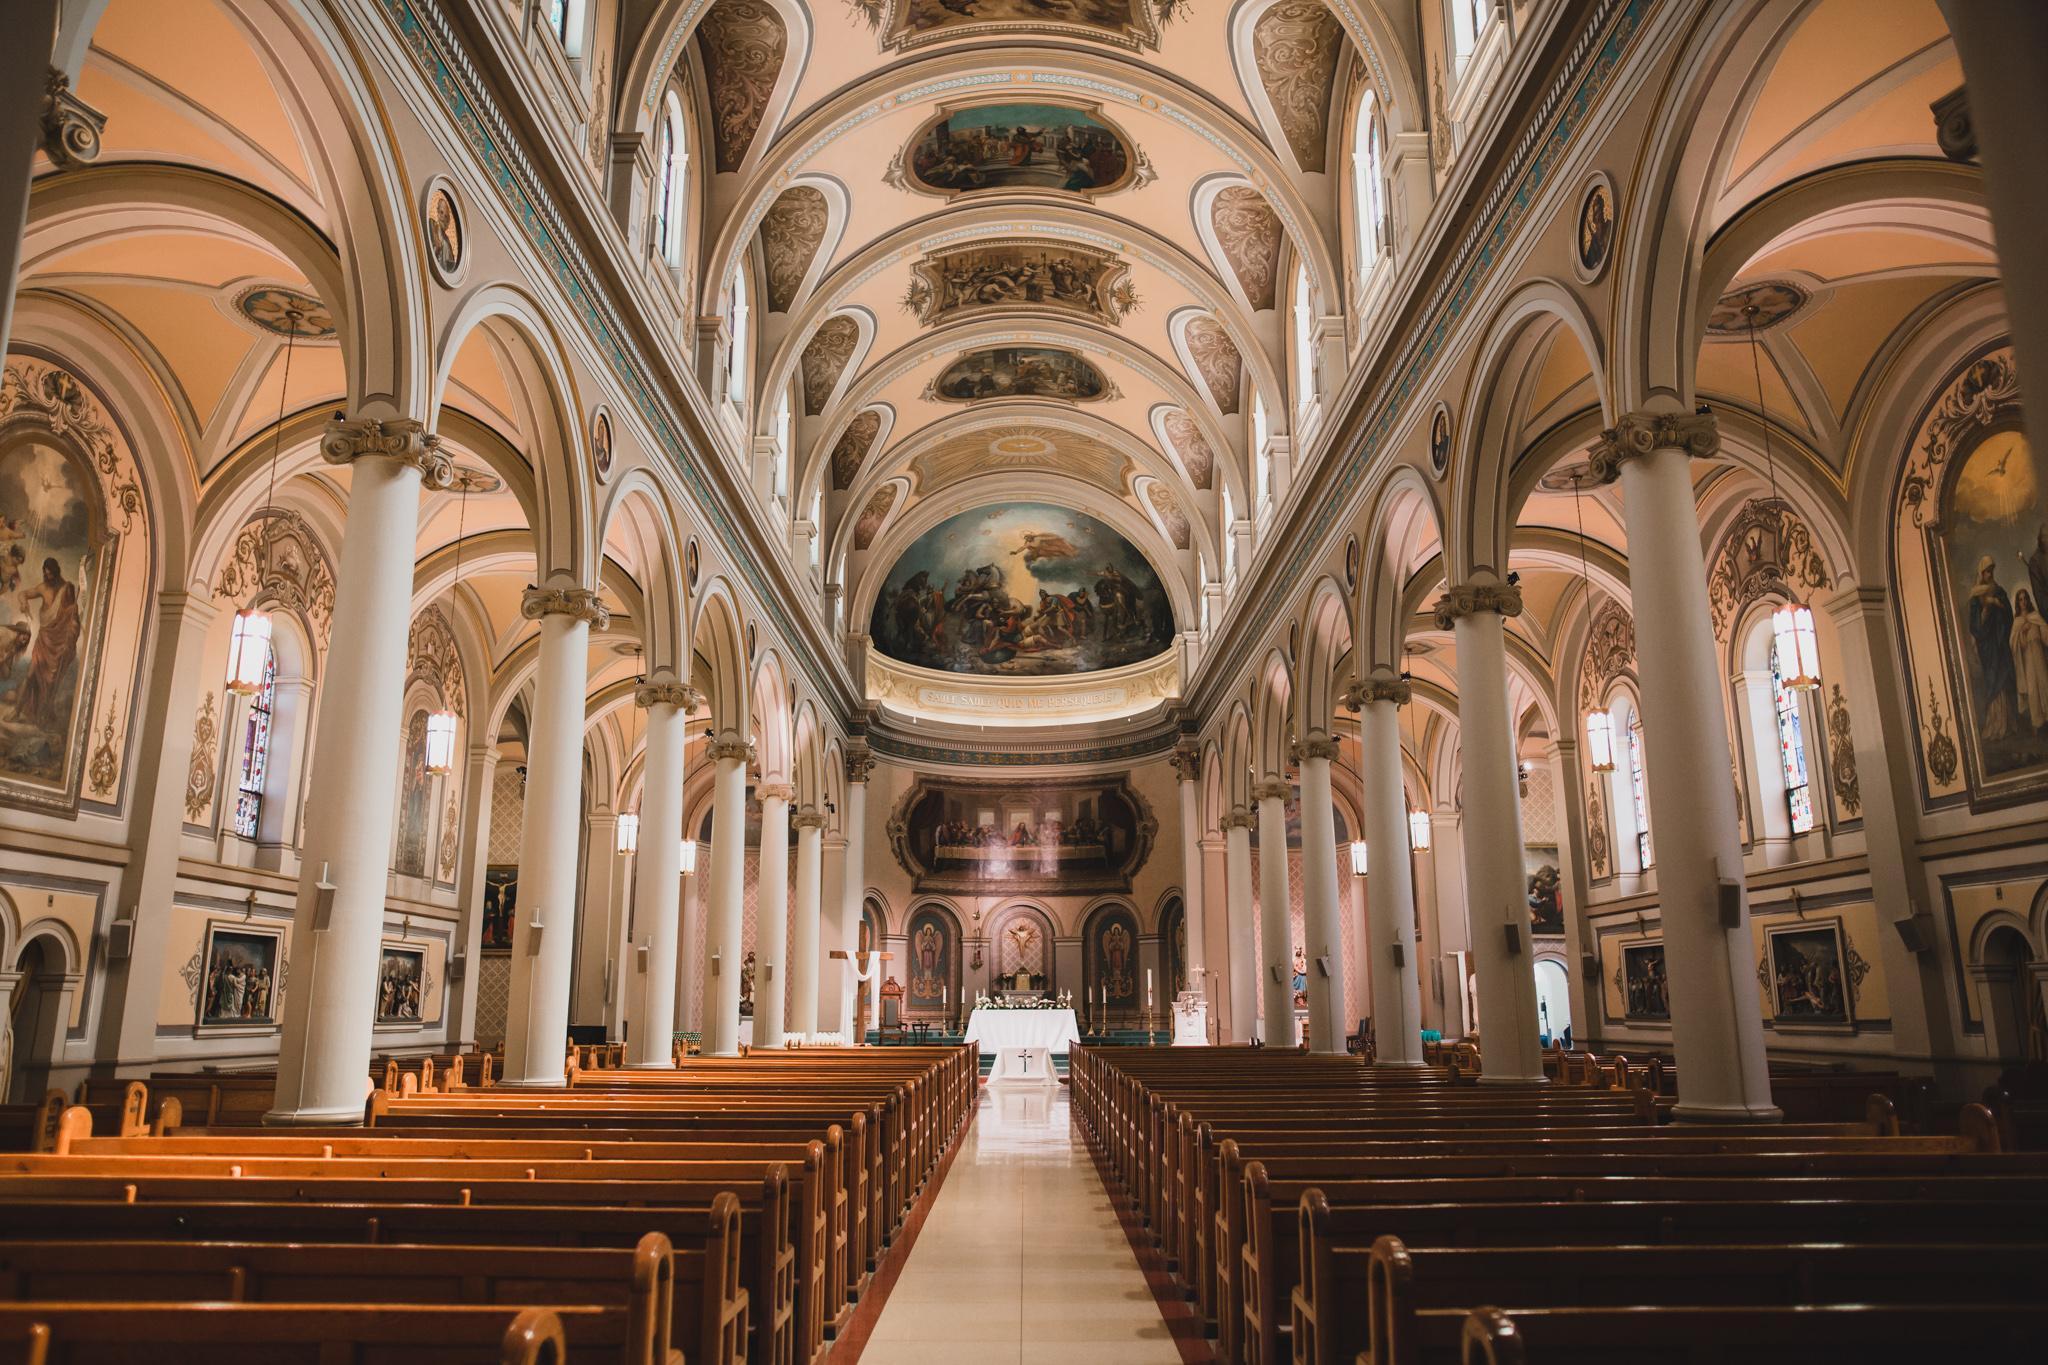 St. Paul's Basilica Toronto Queen St.